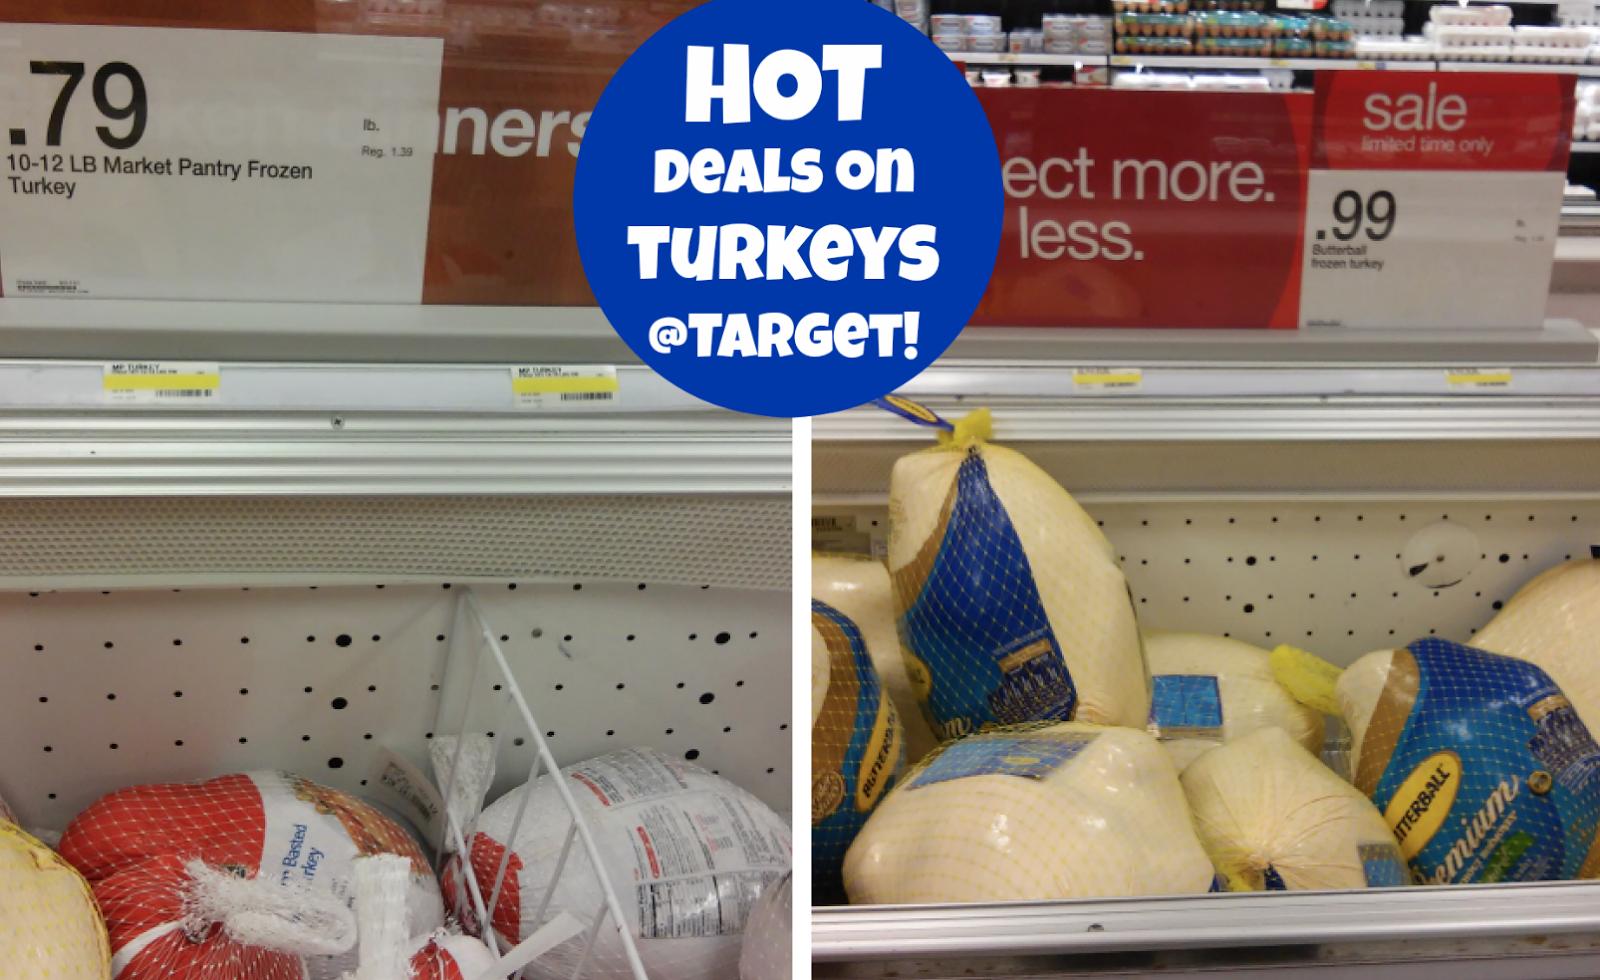 http://www.thebinderladies.com/2014/10/target-frozen-turkeys-as-low-as-79-per.html